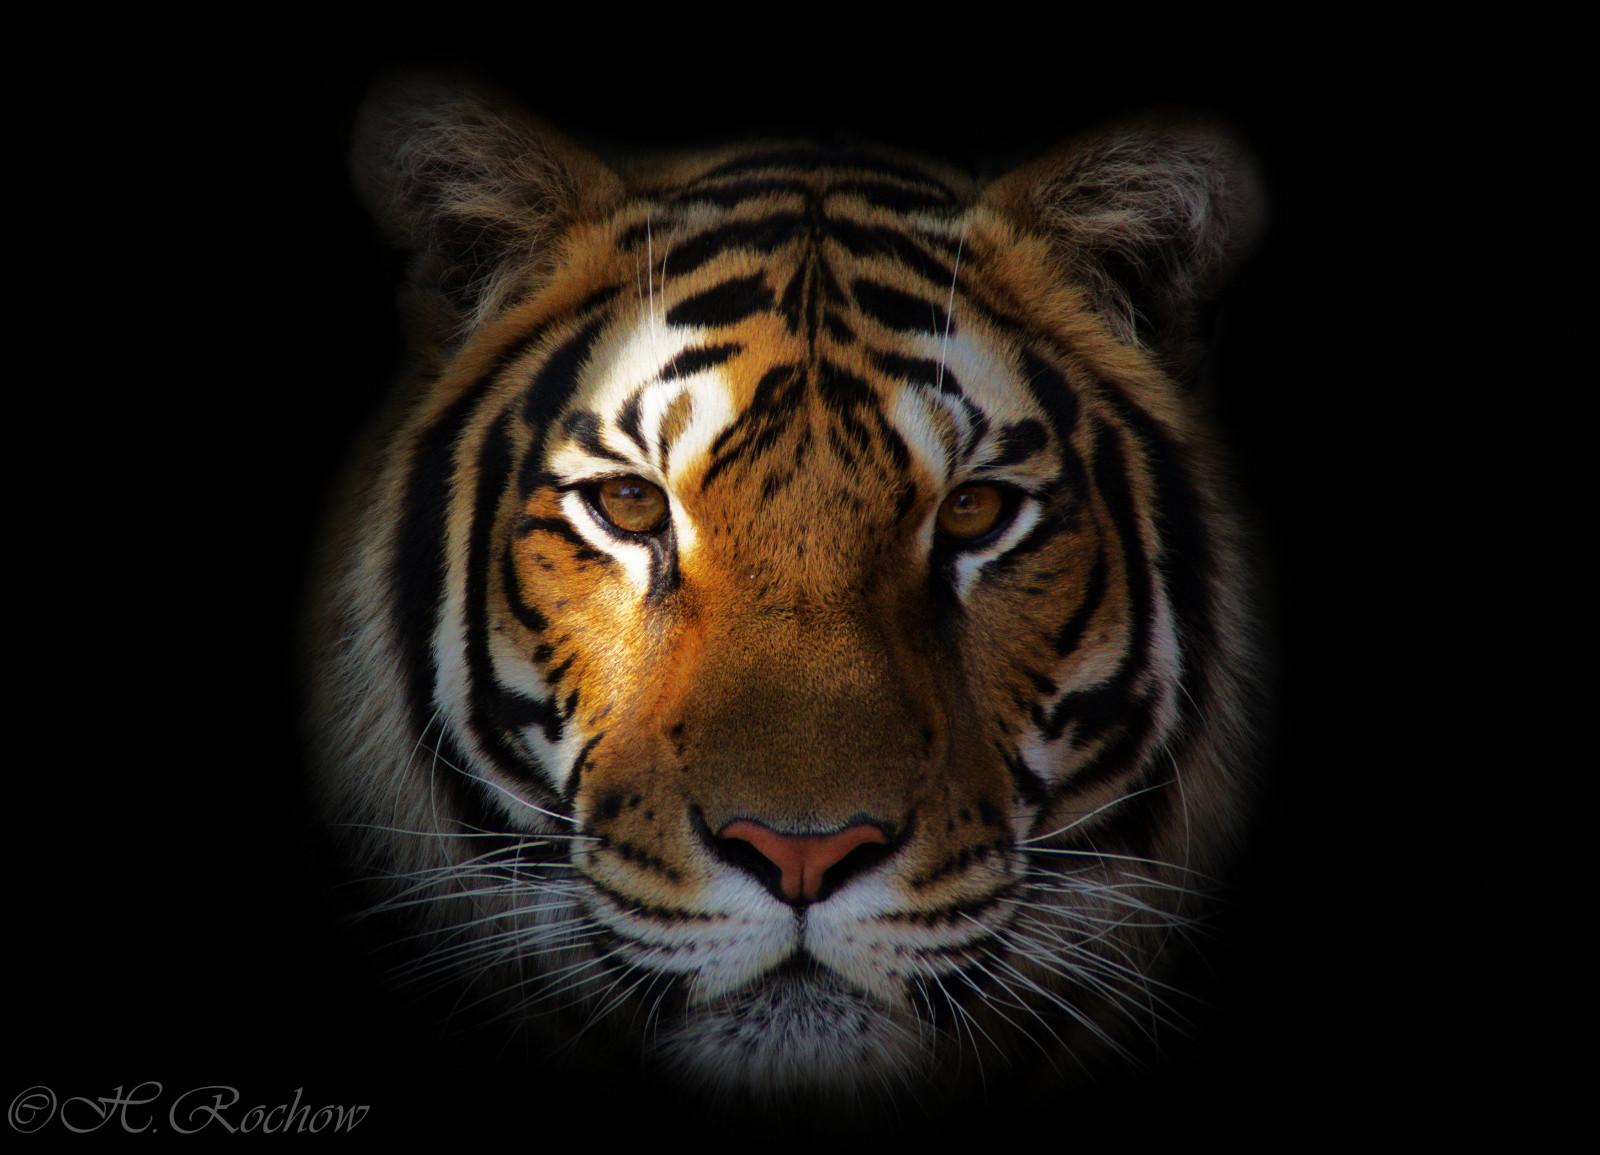 8k Animal Wallpaper Download: Wallpaper : Face, Tiger, Wildlife, Big Cats, Zoo, Whiskers